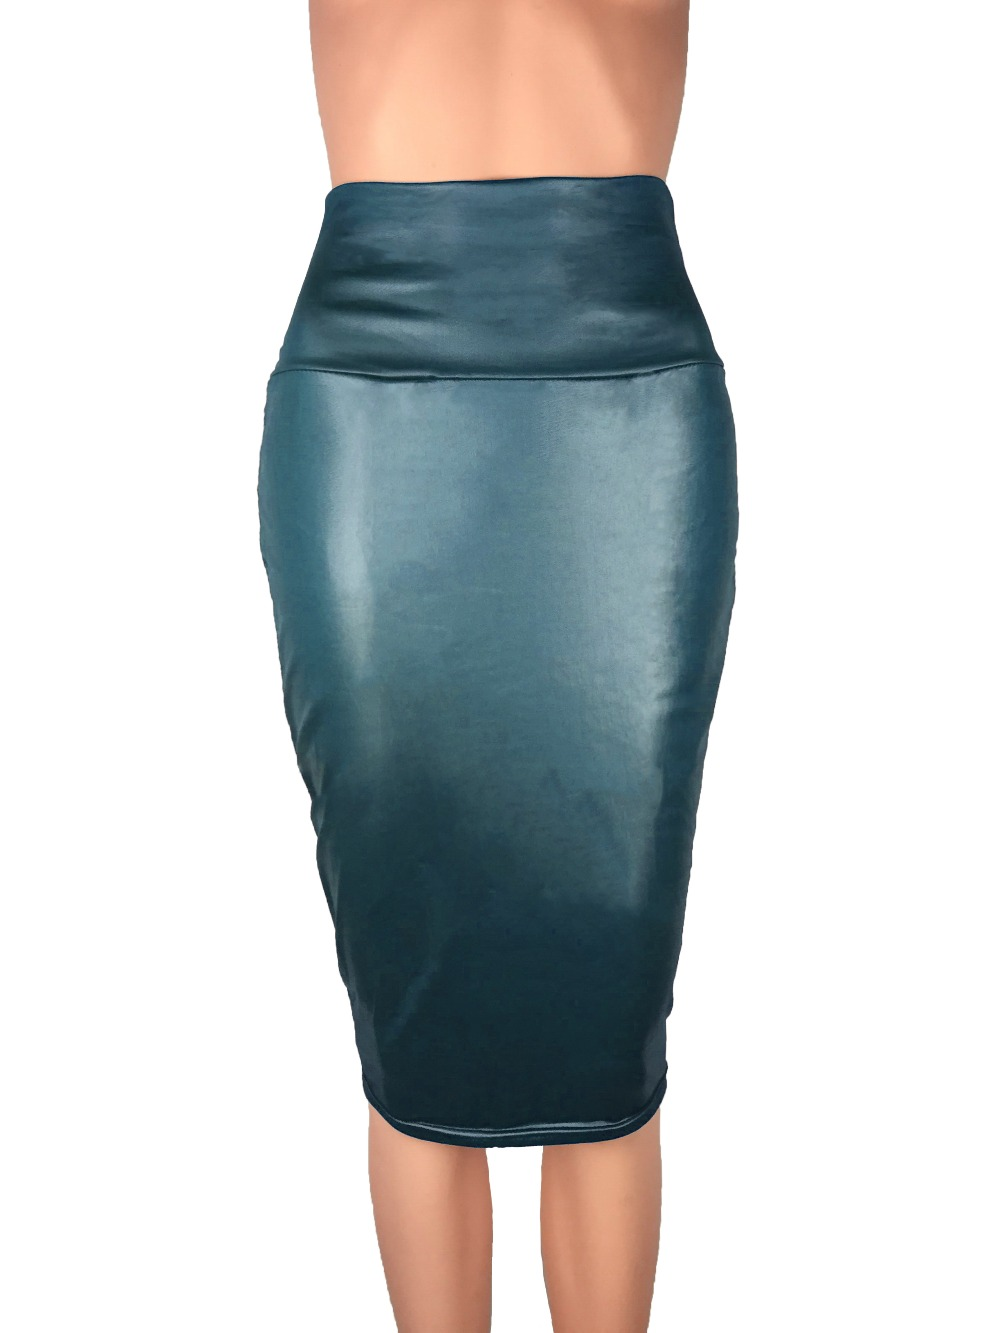 Bohocotol 2018 μολύβι faux δερμάτινη φούστα - Γυναικείος ρουχισμός - Φωτογραφία 3